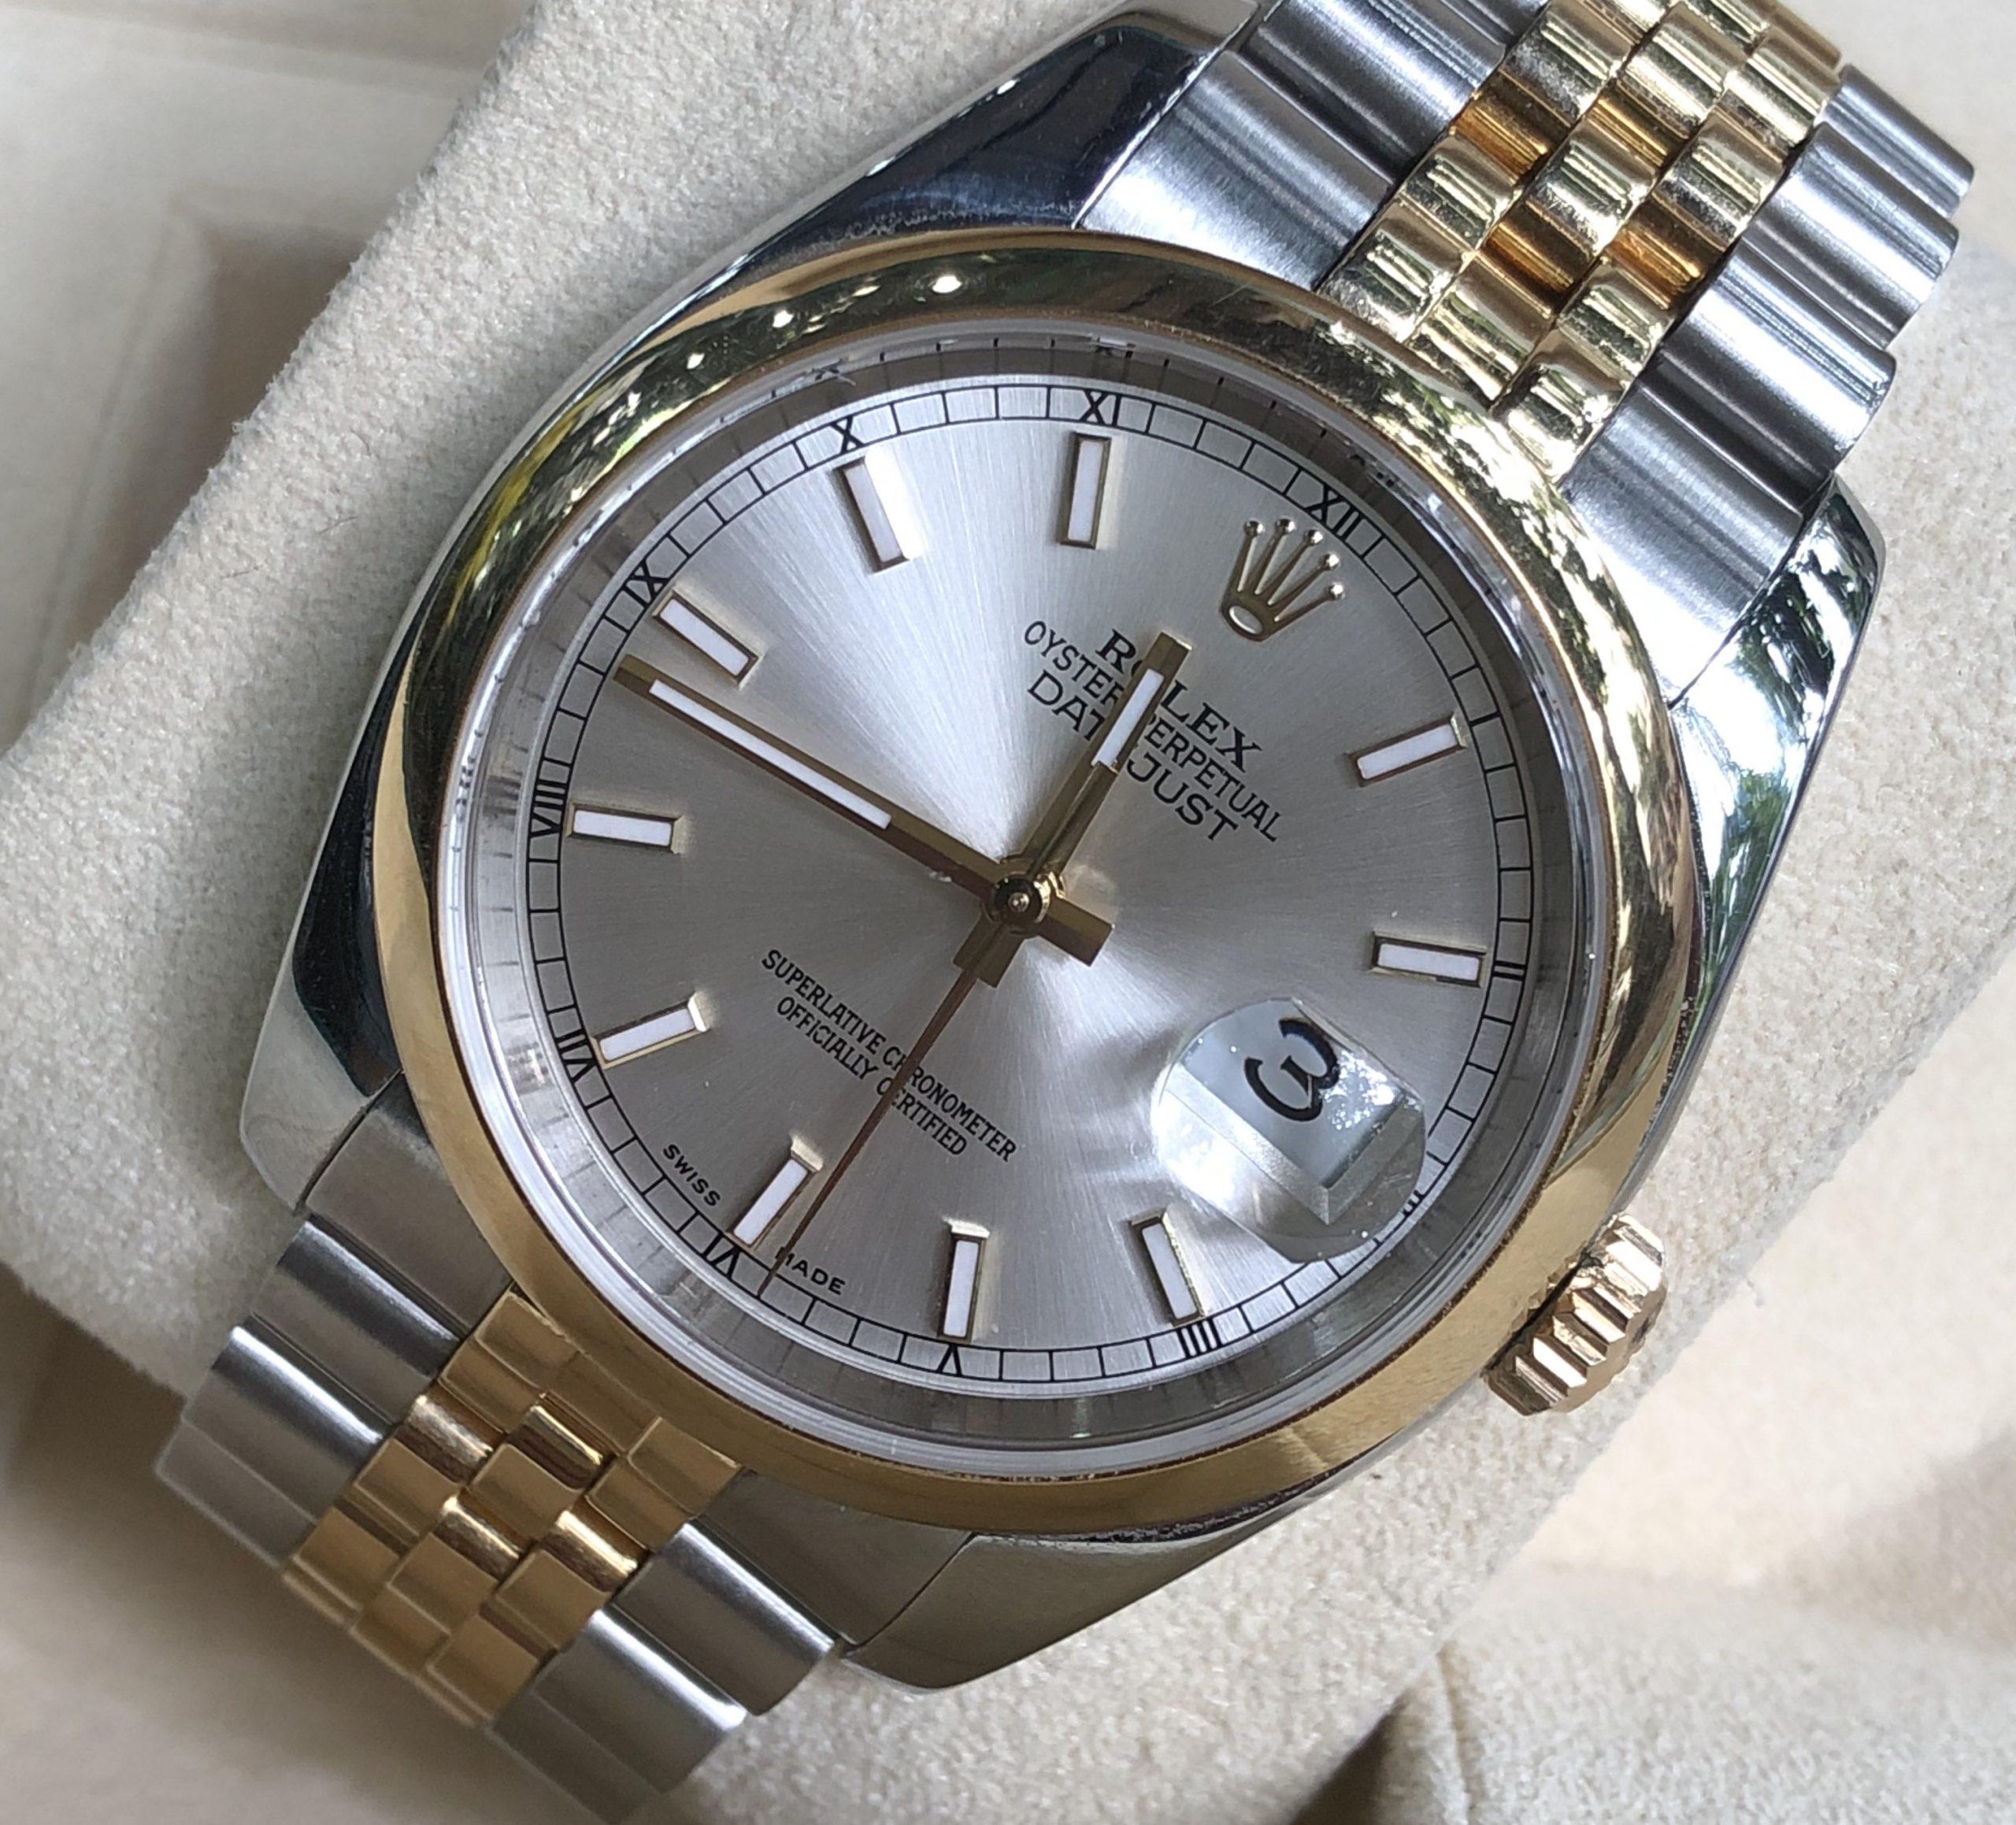 Rolex 116203 mặt trắng tia demi vàng 18k đời 2004/2005